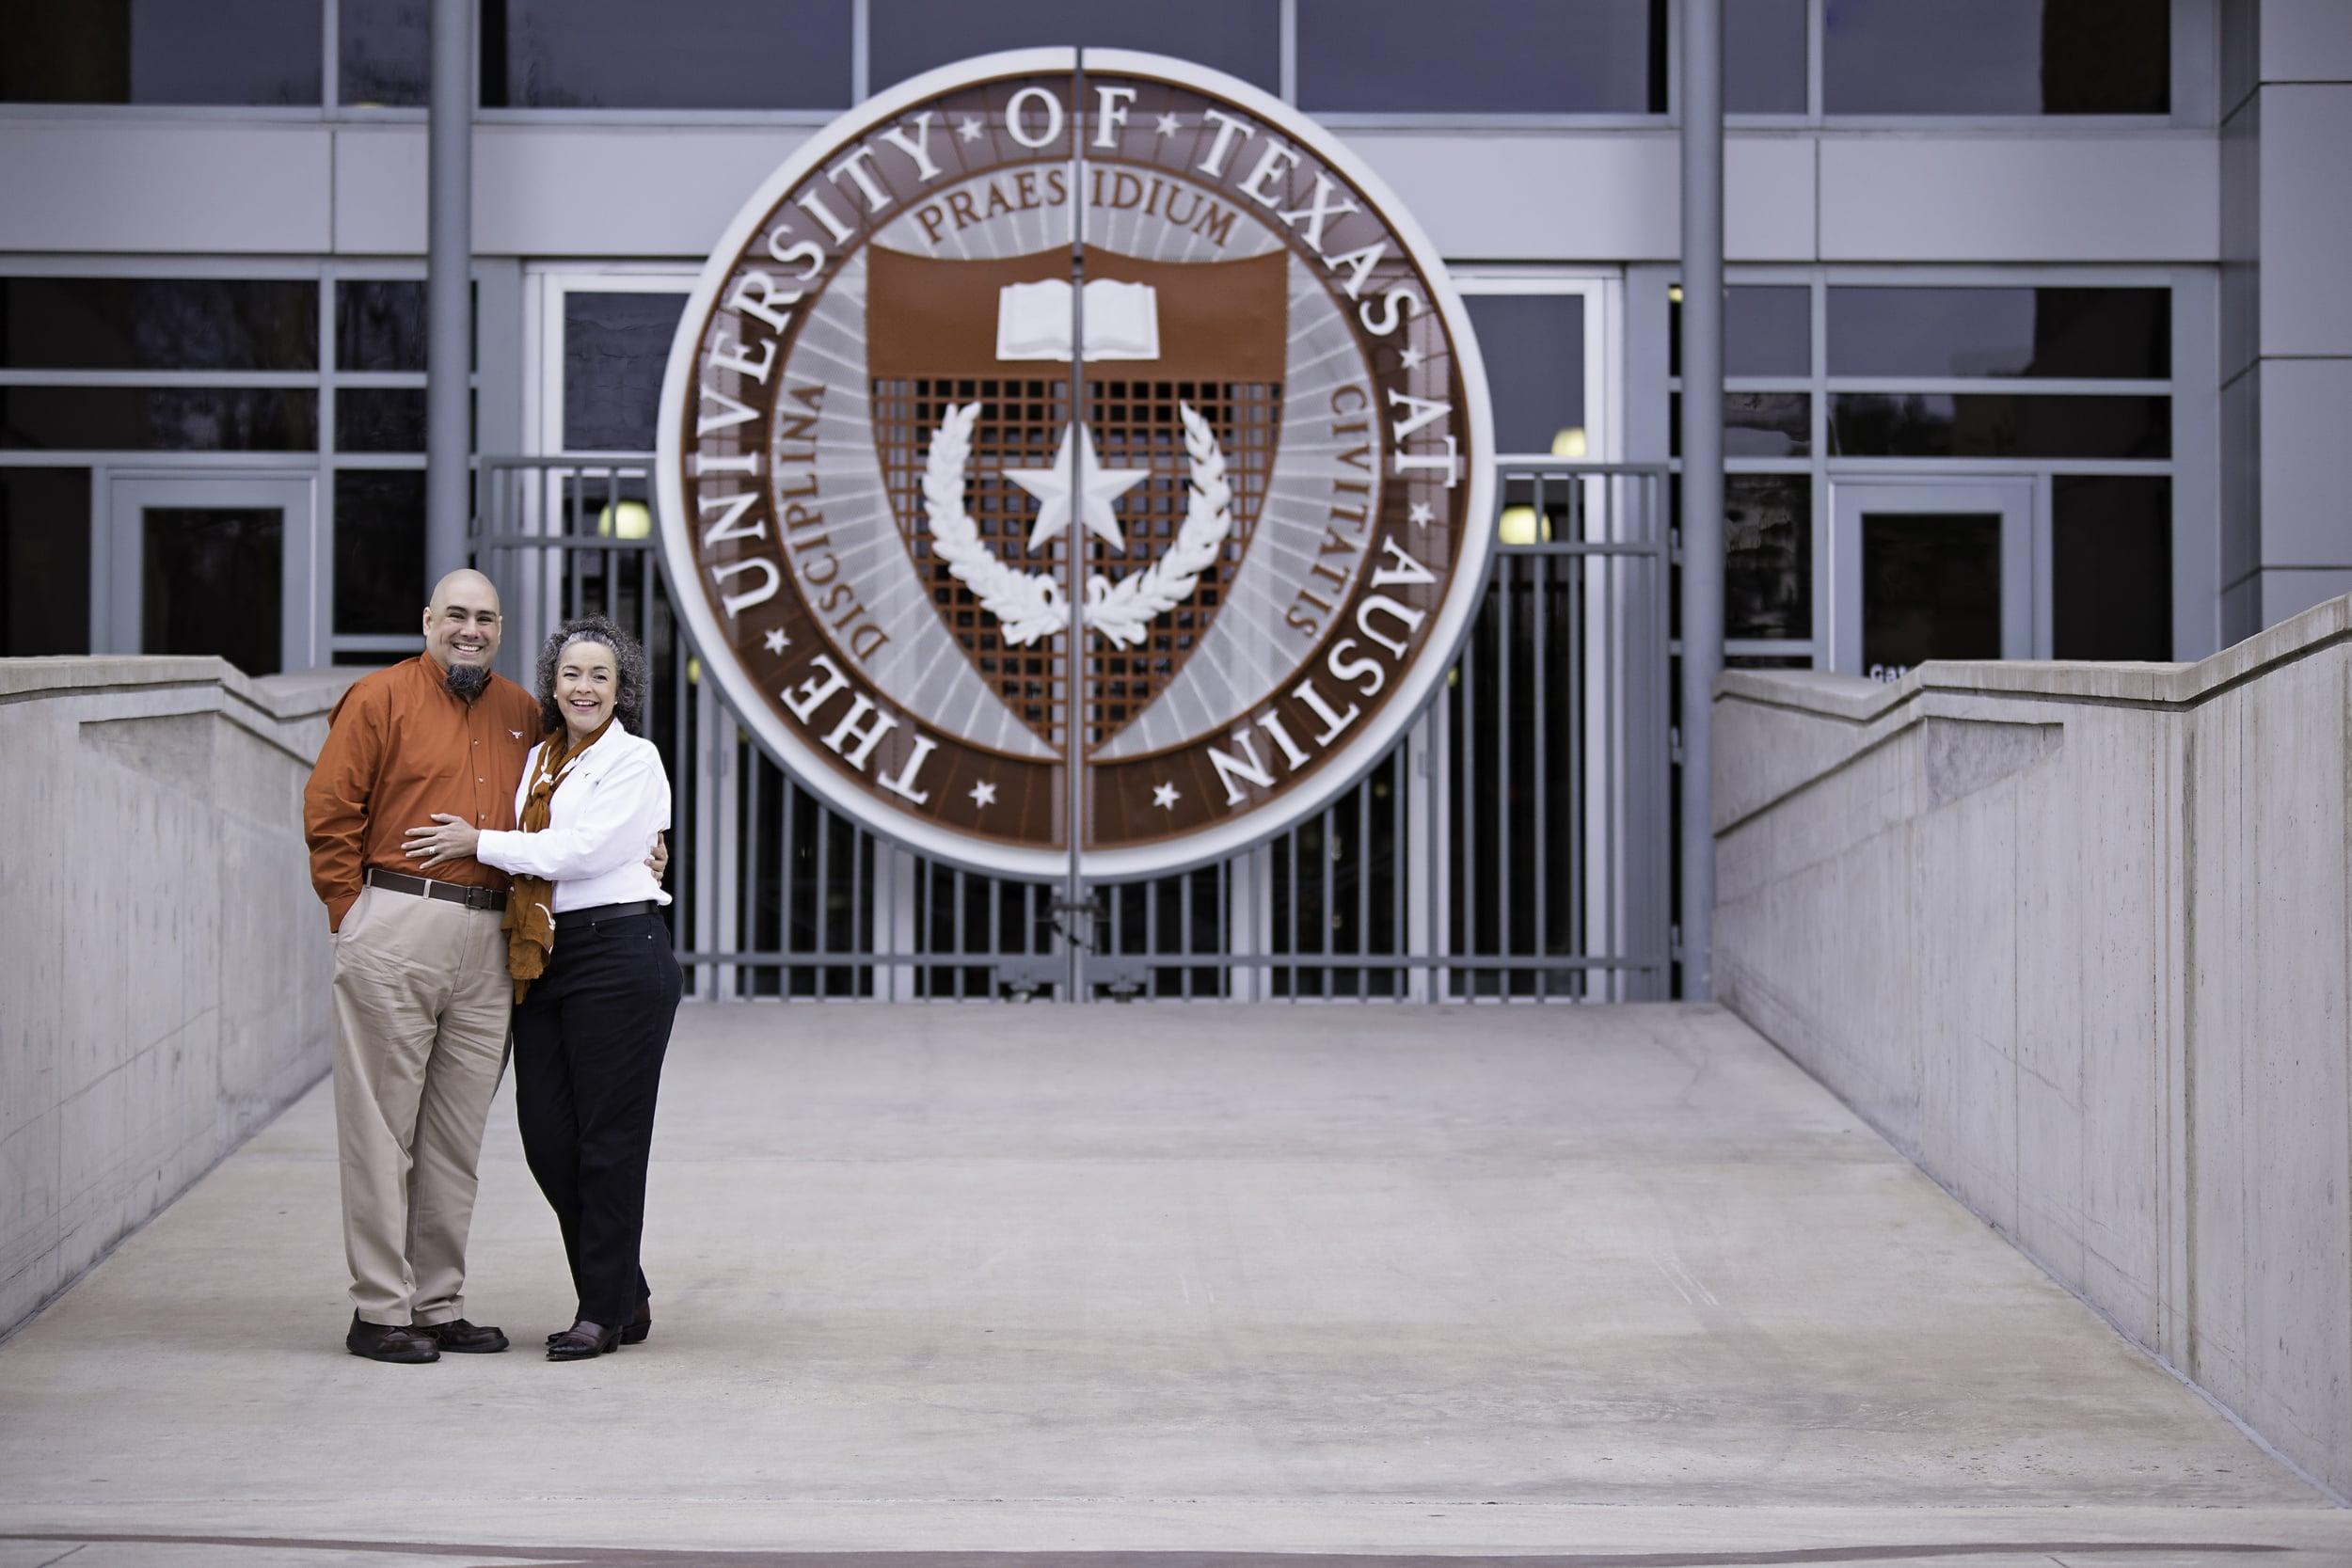 University_Texas_Engagement_Session_02